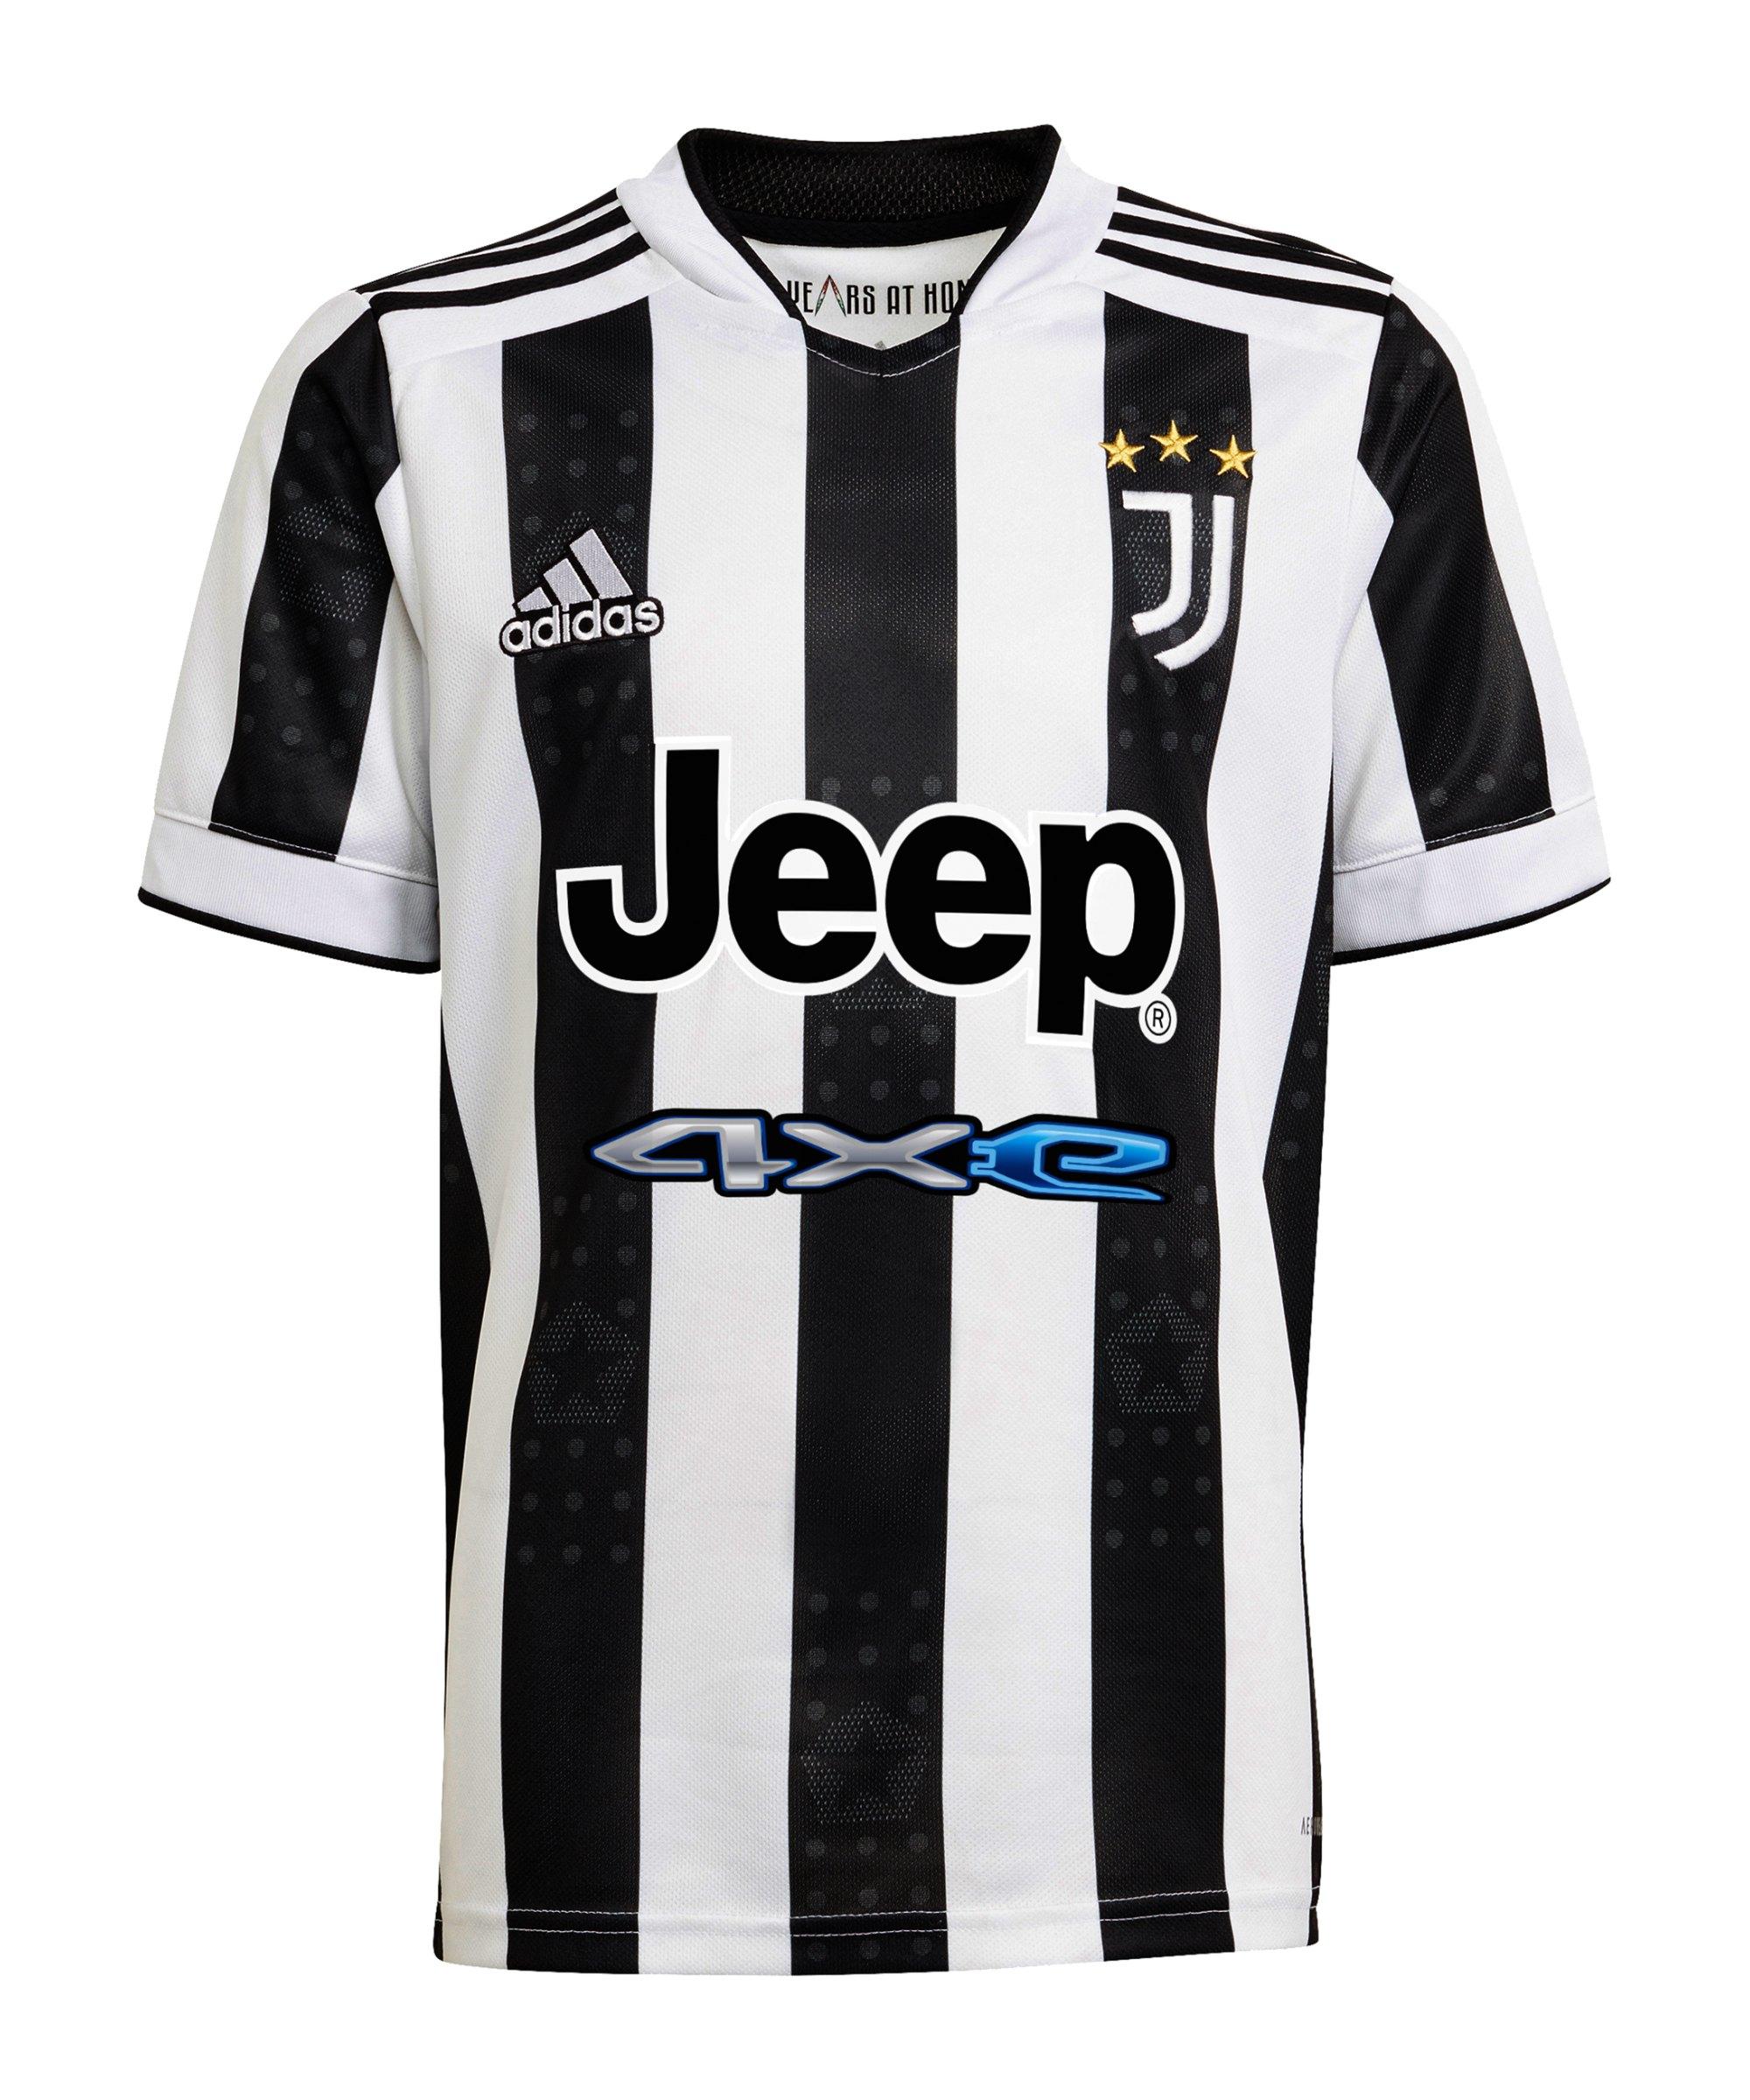 adidas Juventus Turin Trikot Home 2021/2022 Kids Weiss - weiss